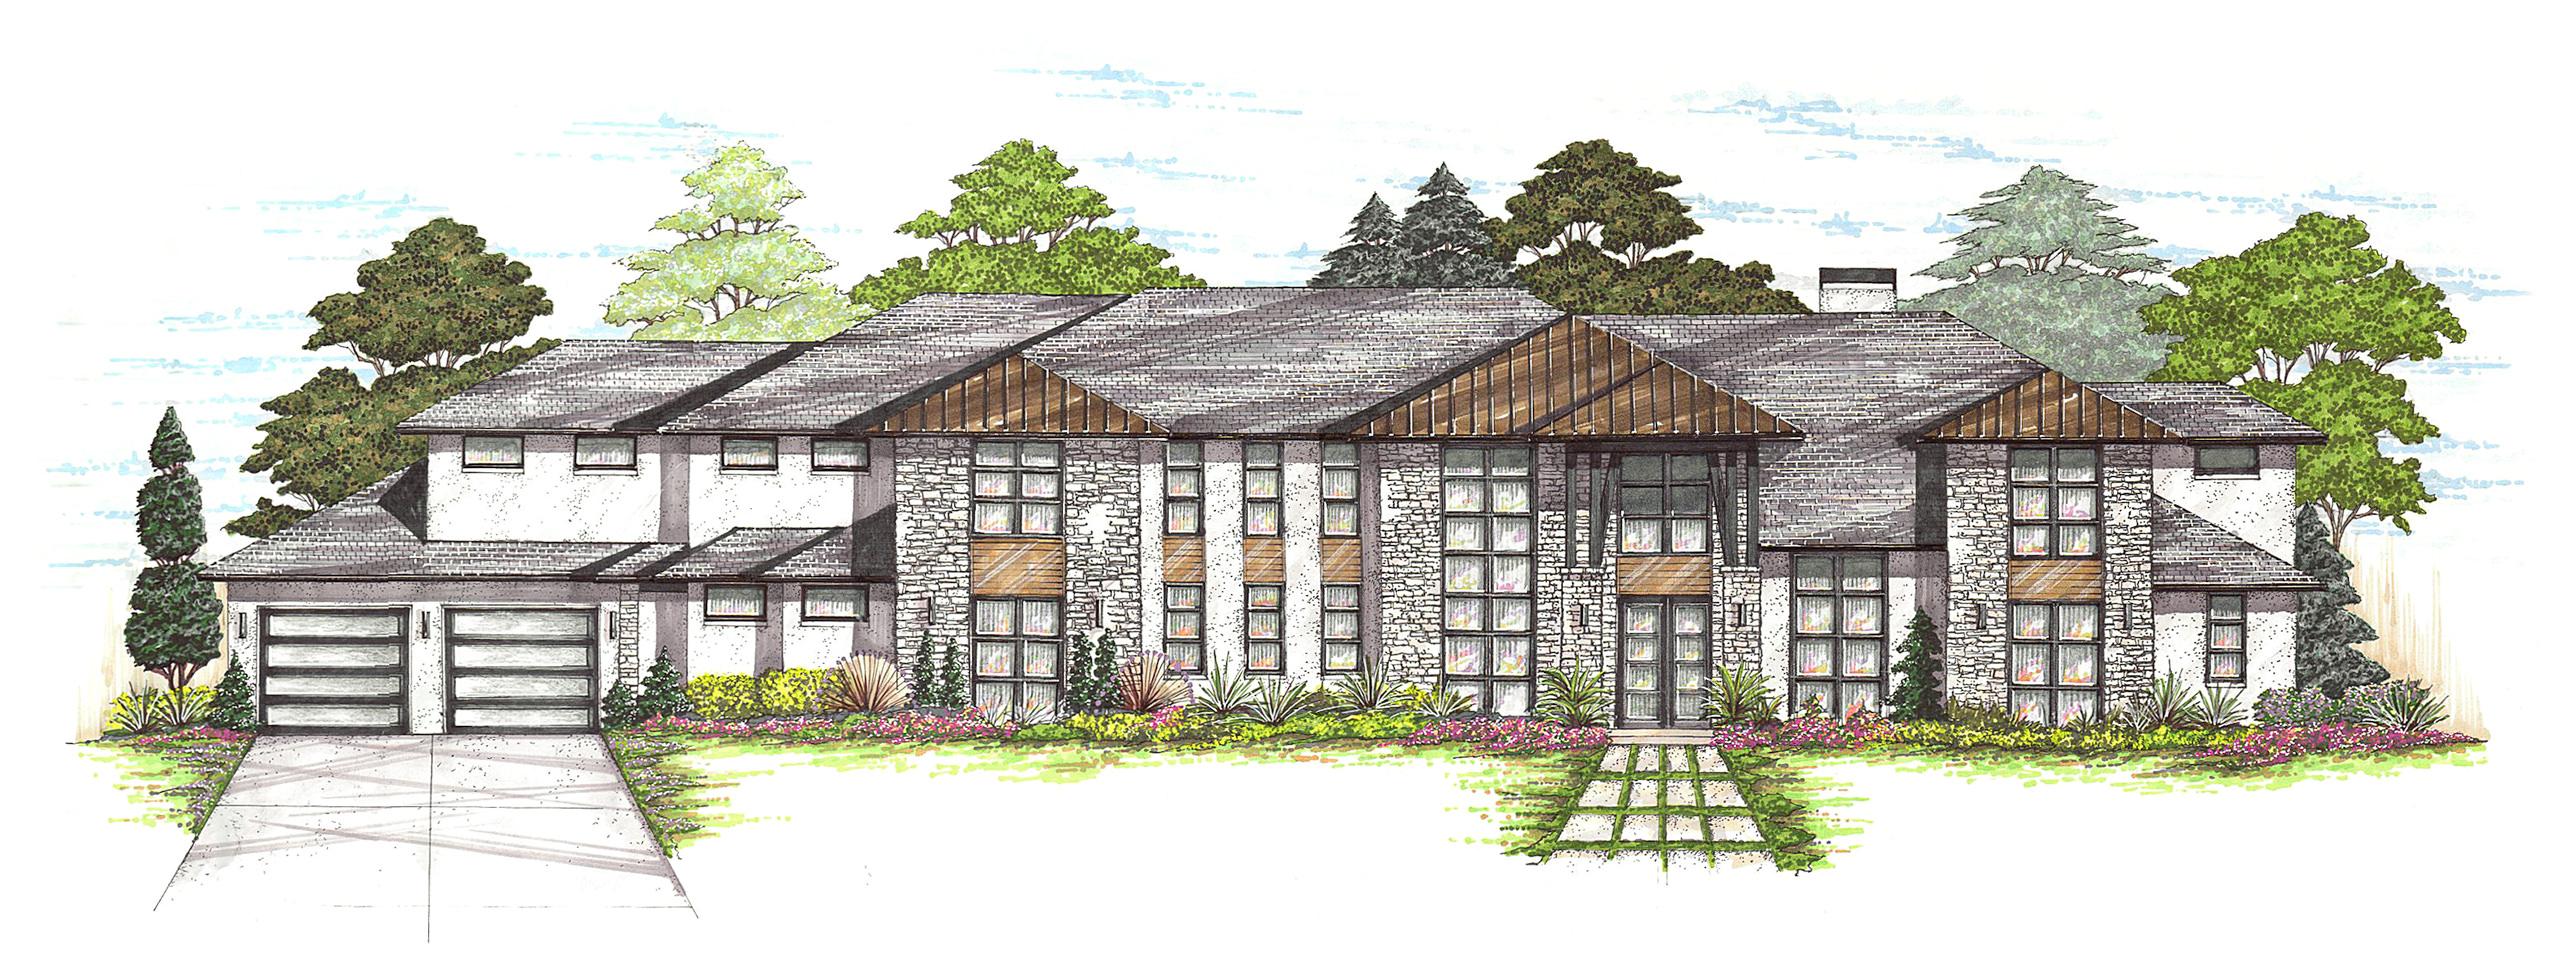 home-styles-bainbridge-design-group-oklahoma